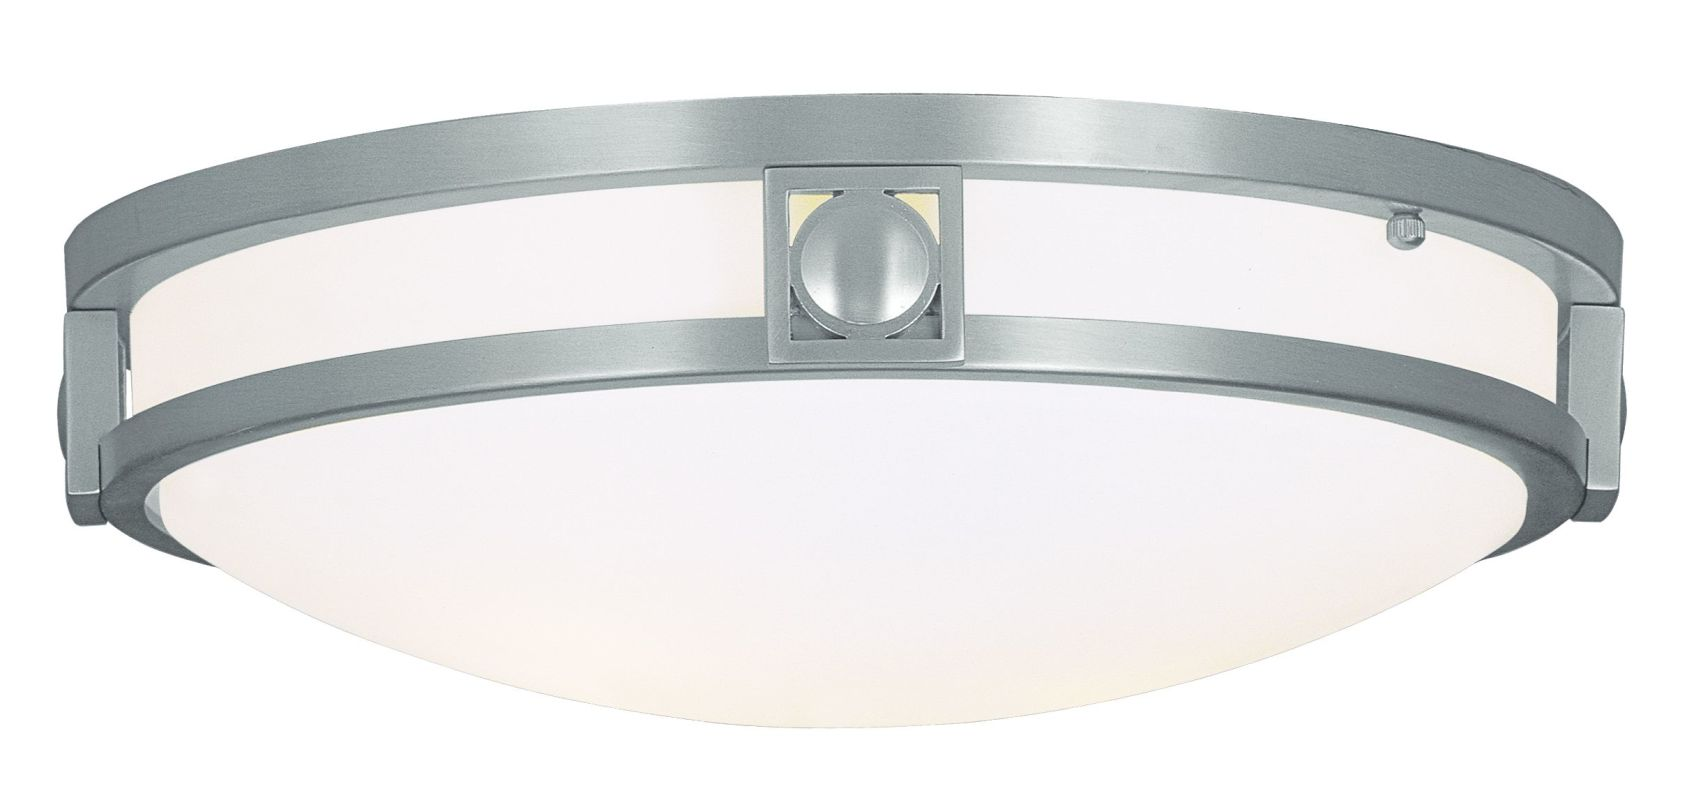 Livex Lighting 4487 2 Light 80 Watt Flushmount Ceiling Fixture with